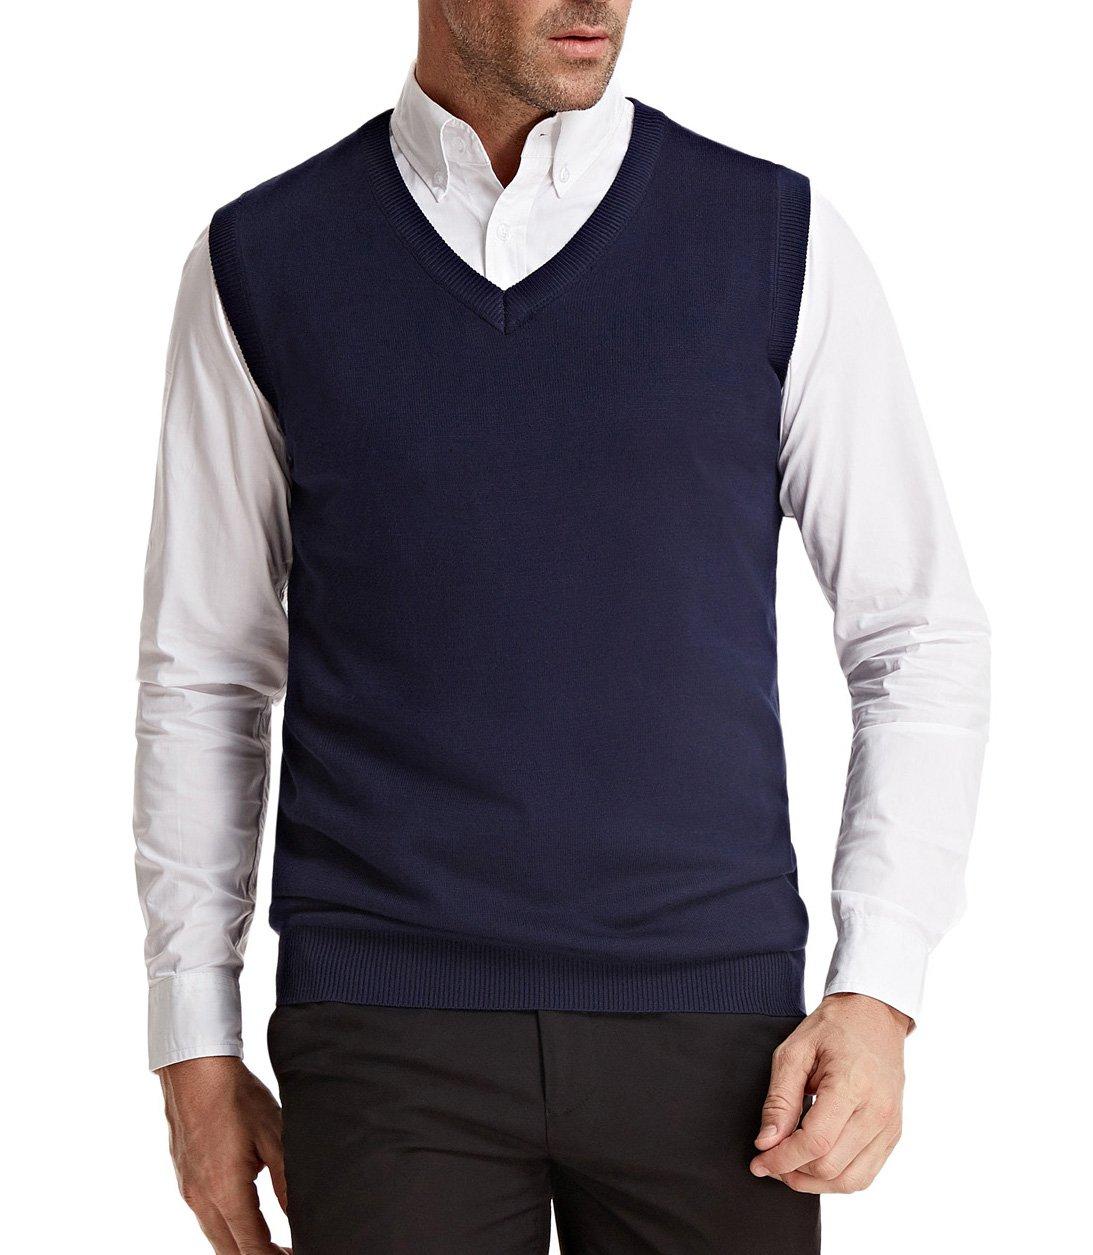 PAUL JONES Men's Cotton Basic Knitted Vest Business Look Big&Tall Size XXL Navy Blue